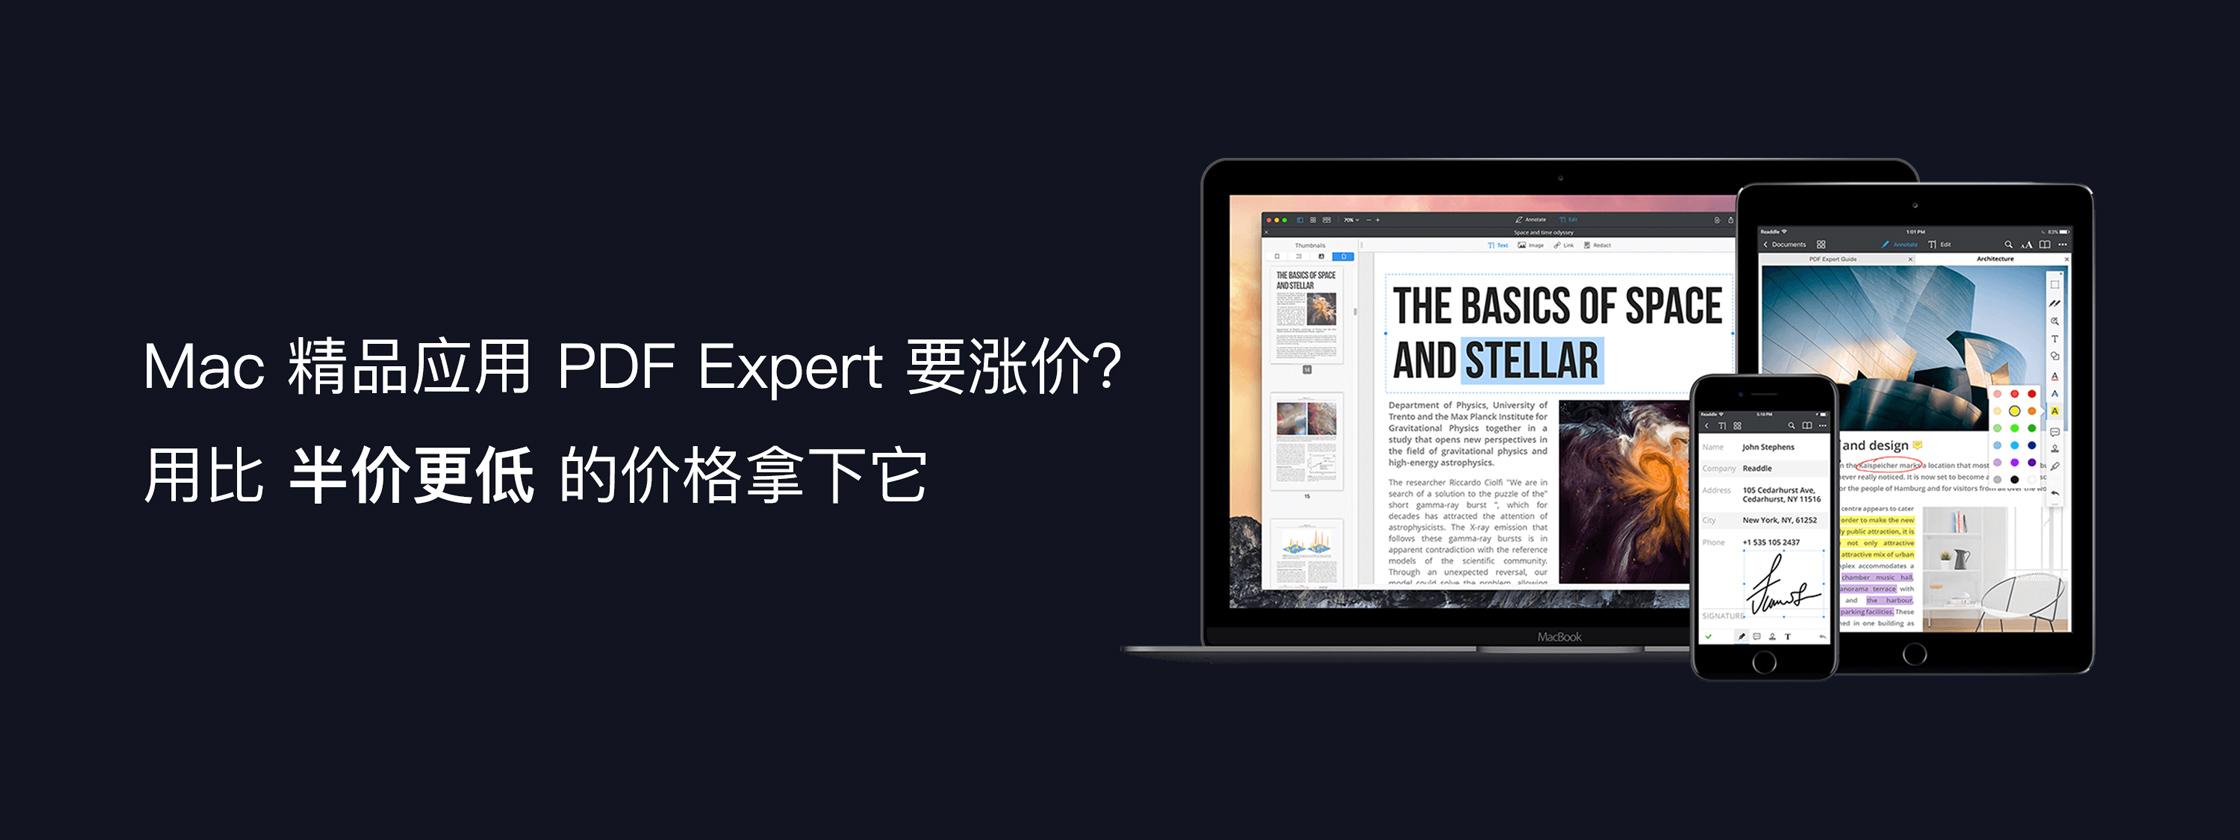 Mac 精品应用 PDF Expert 要涨价?用比半价更低的价格拿下它